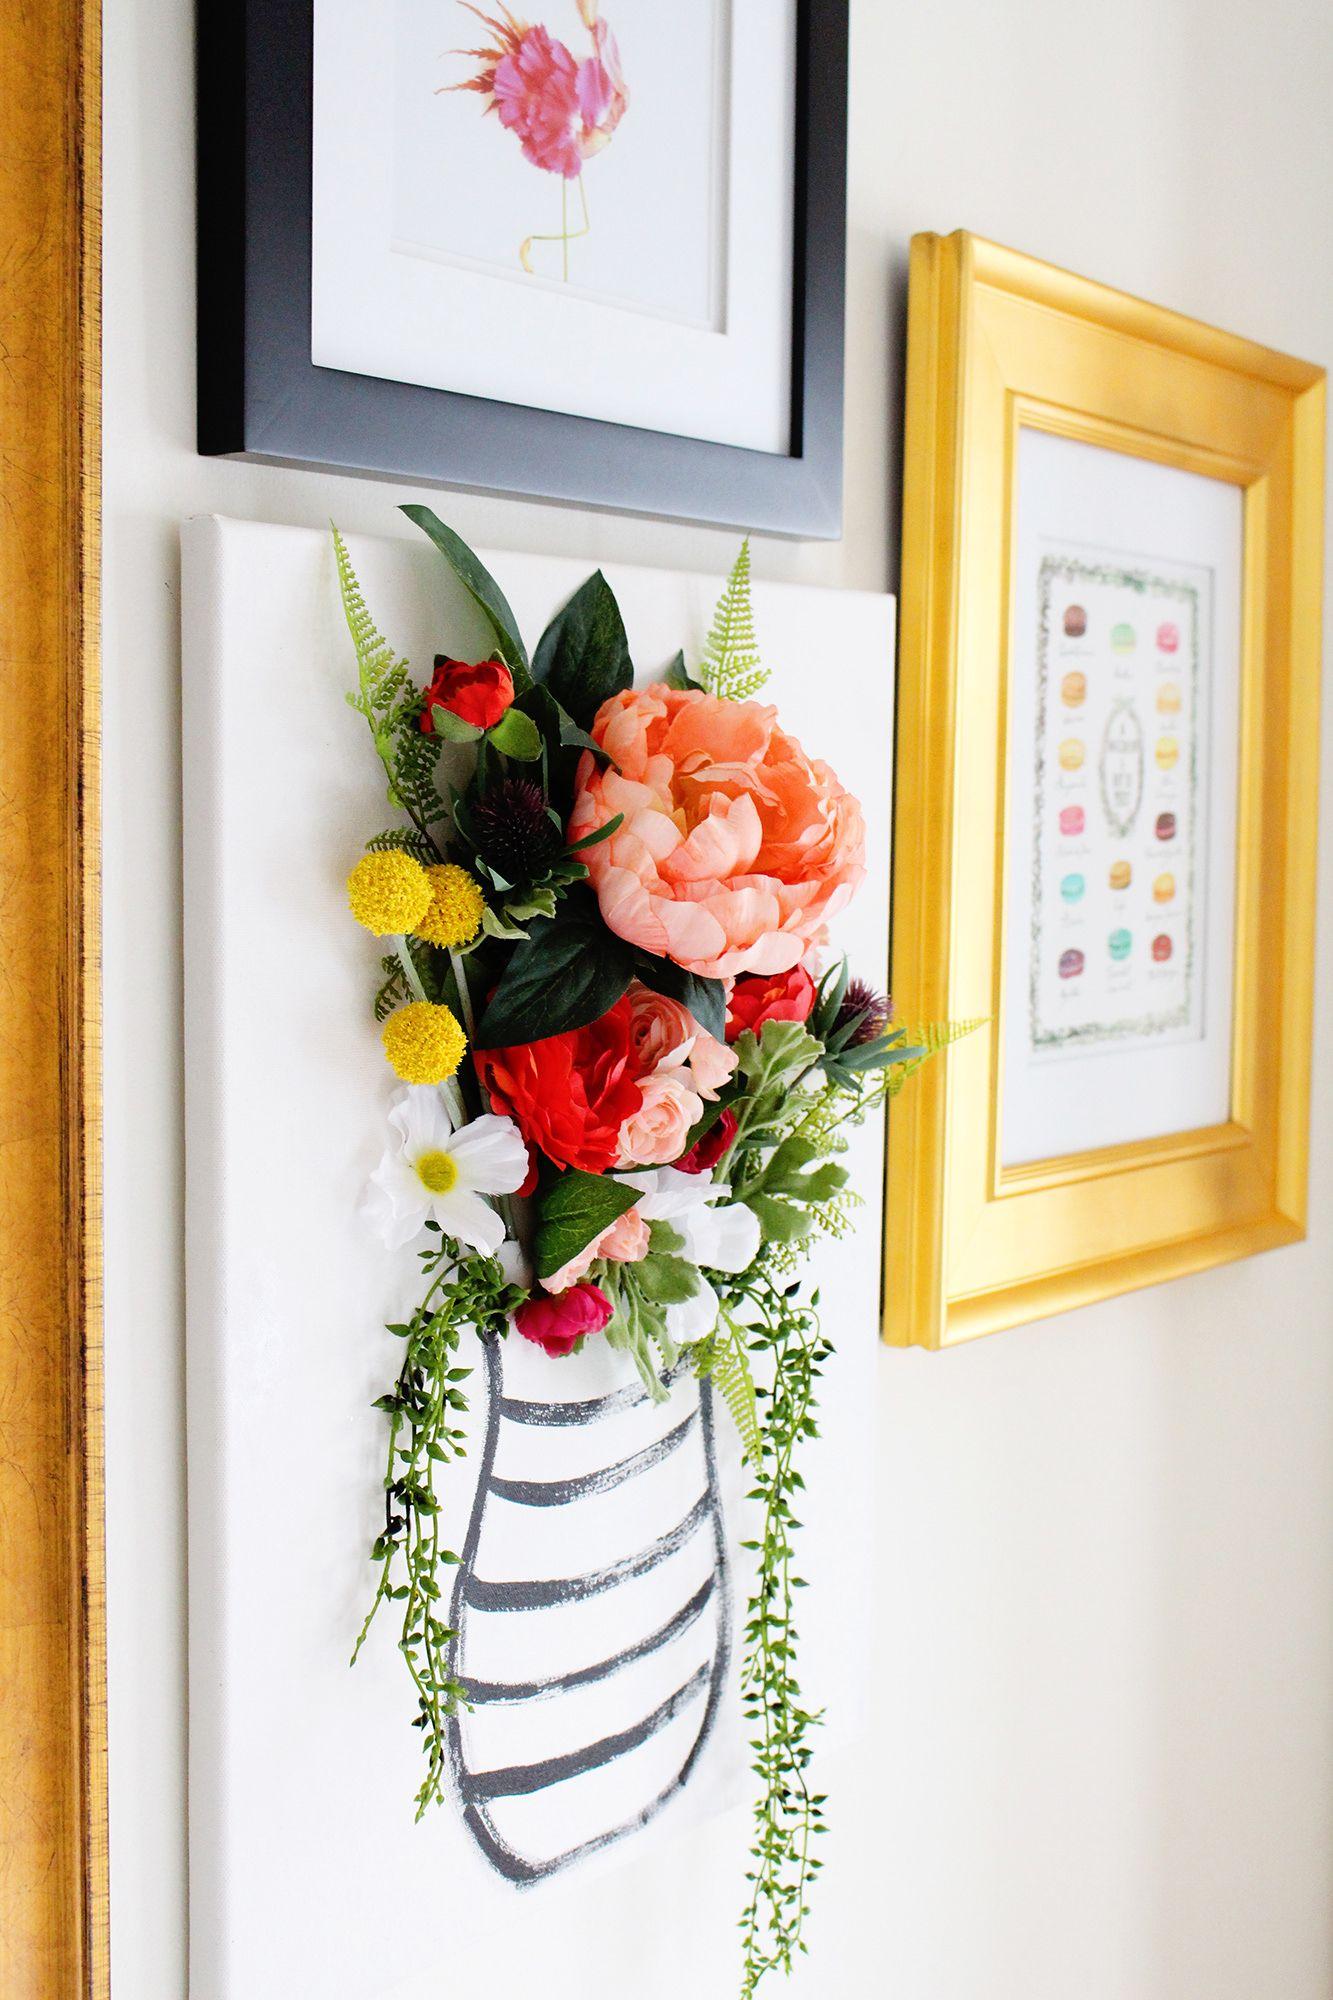 DIY 3 D Flower Canvas Art Part 1 DIY DECOR Pinterest